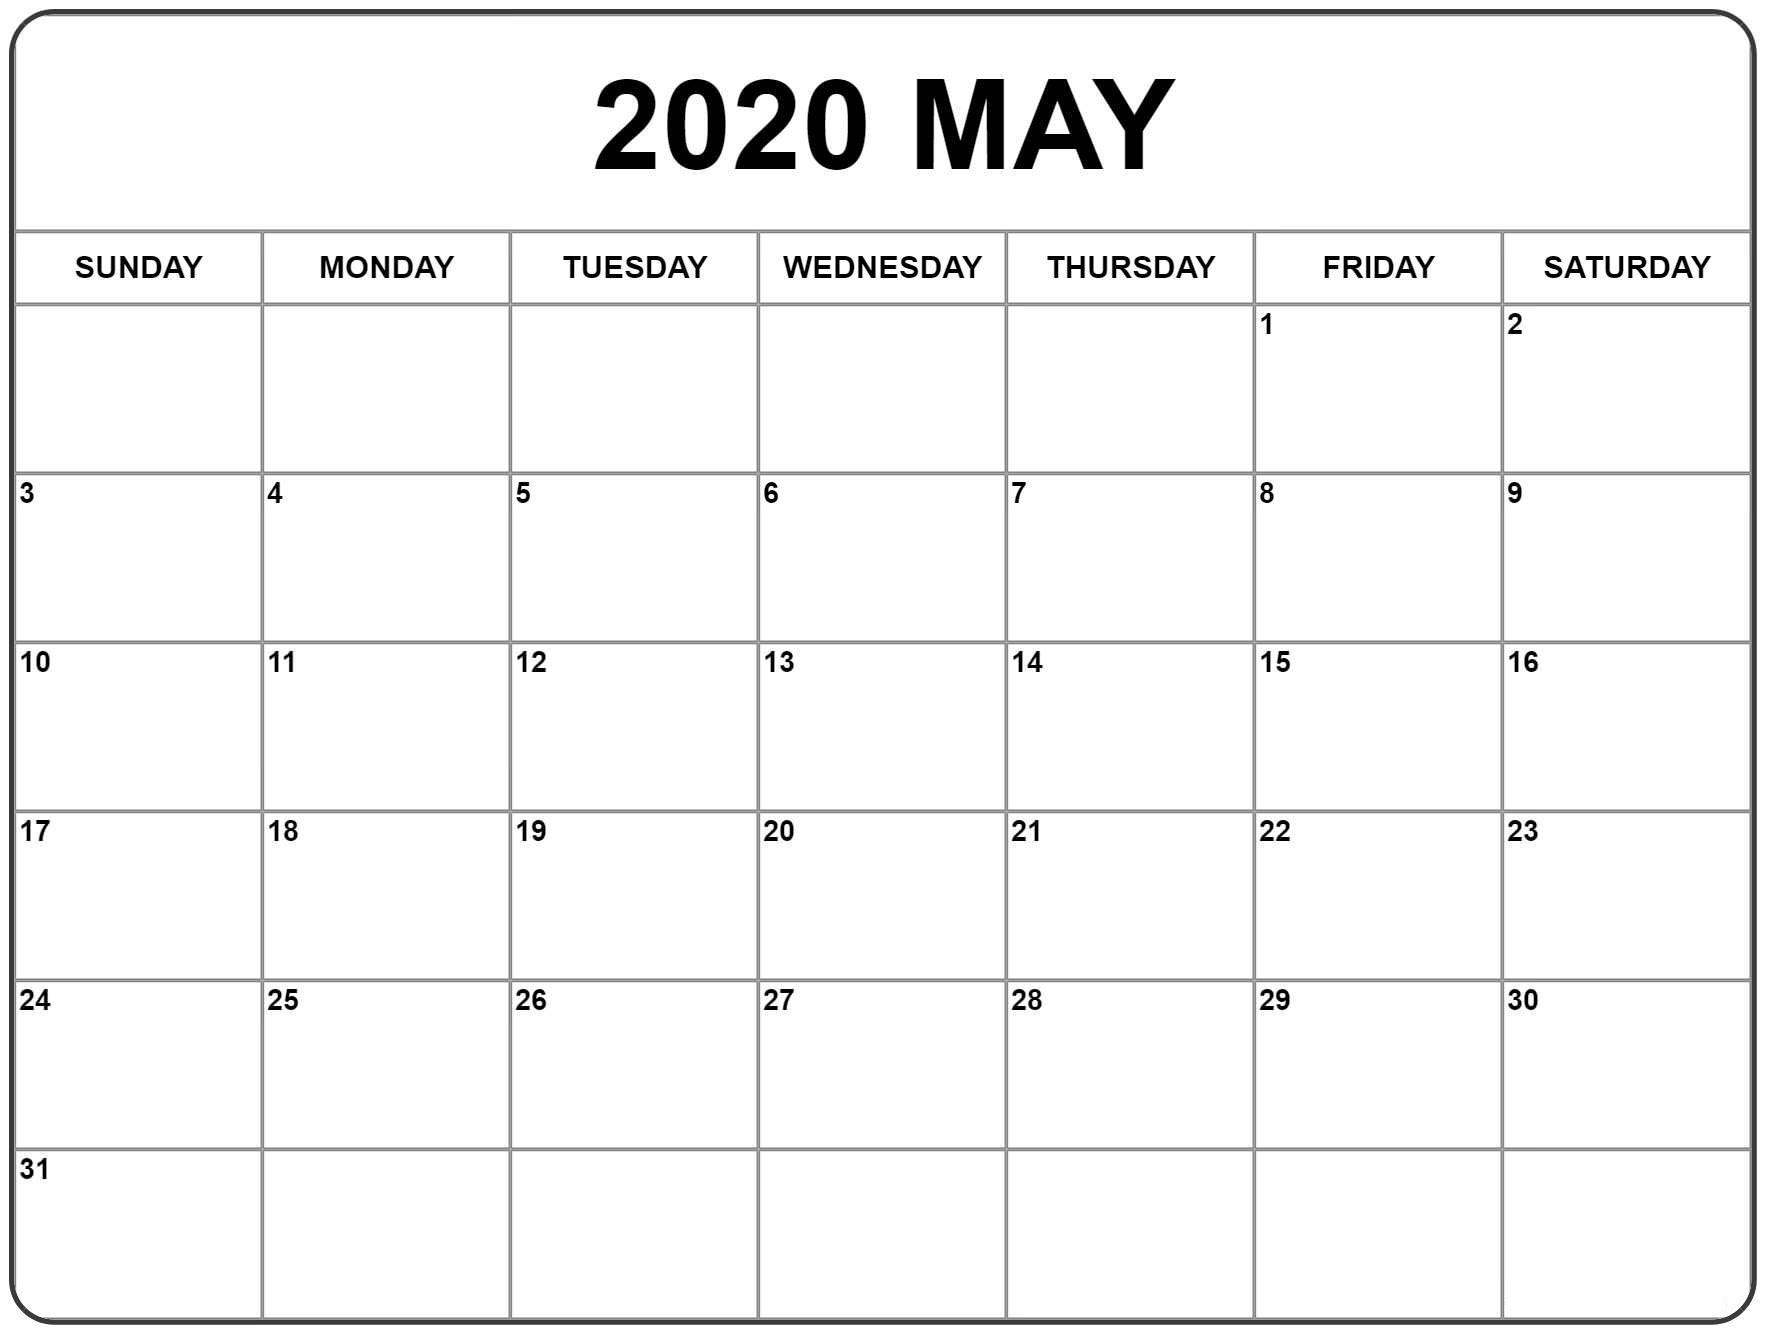 2020 May Template Calendar